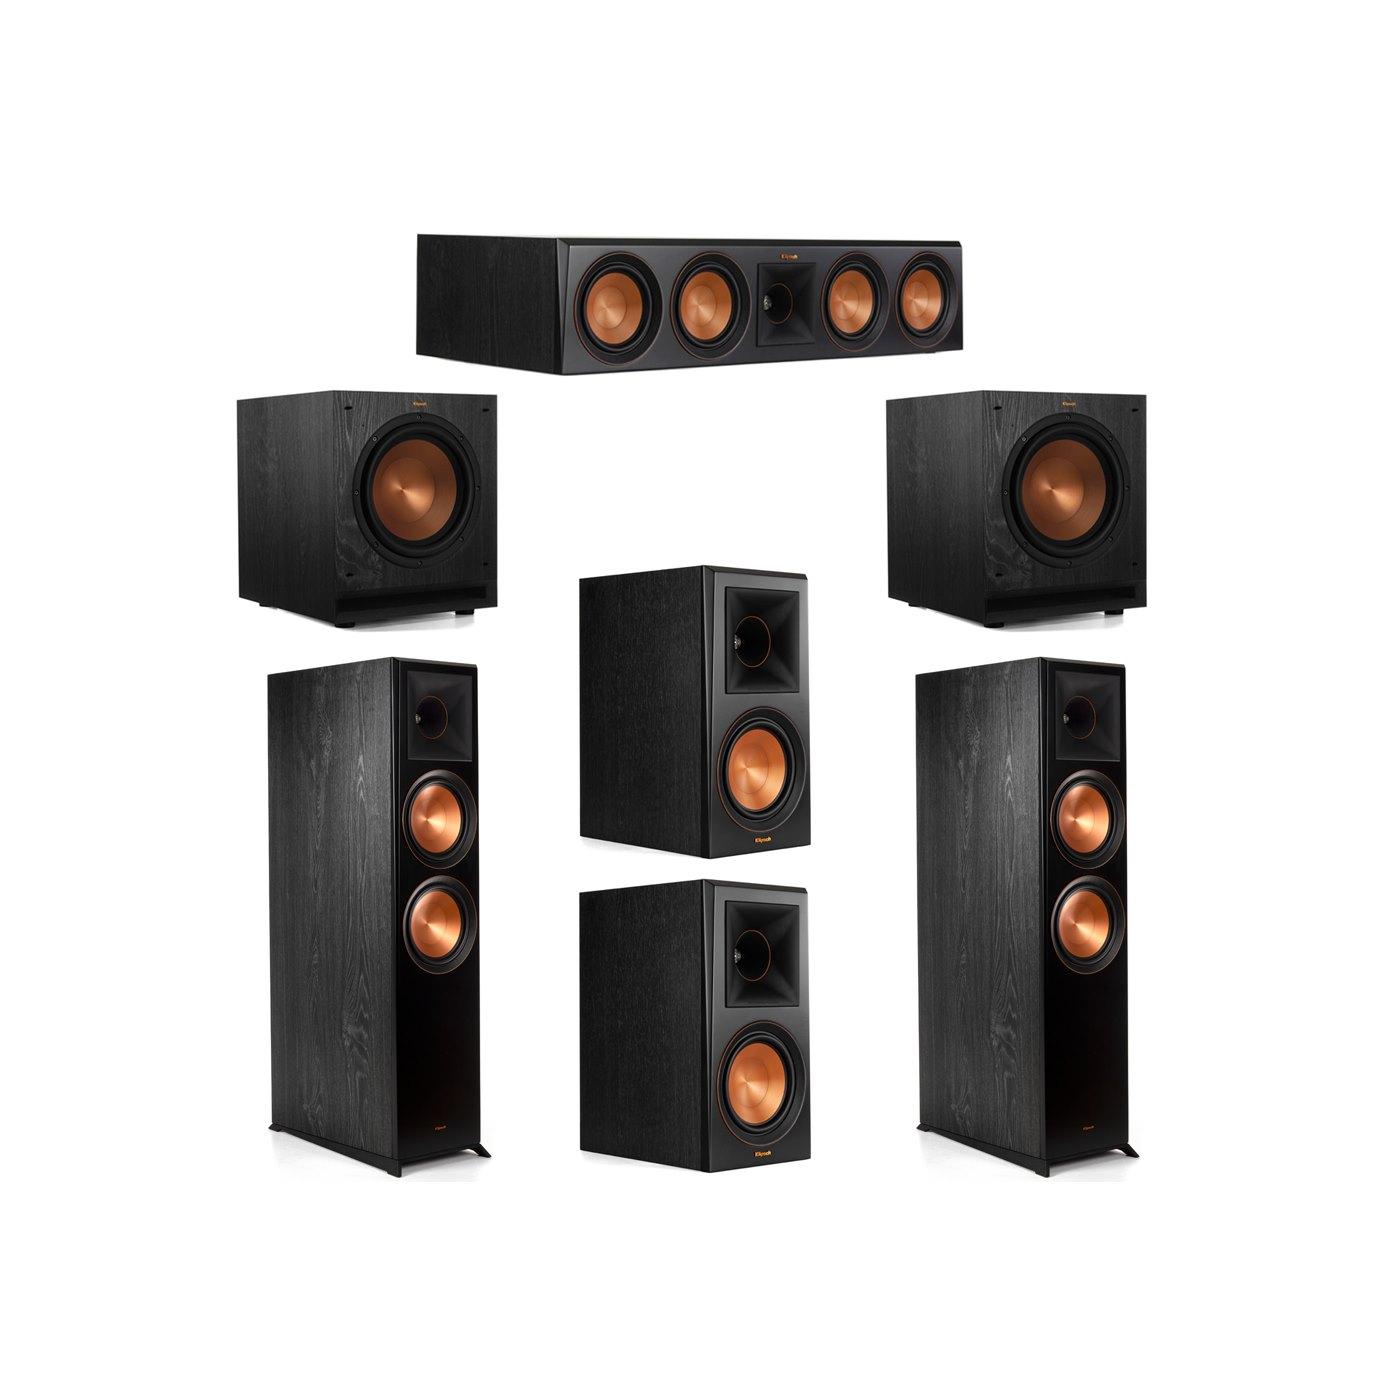 Klipsch 5.2 System with 2 RP-8000F Floorstanding Speakers, 1 Klipsch RP-504C Center Speaker, 2 Klipsch RP-600M Surround Speakers, 2 Klipsch SPL-100 Subwoofers